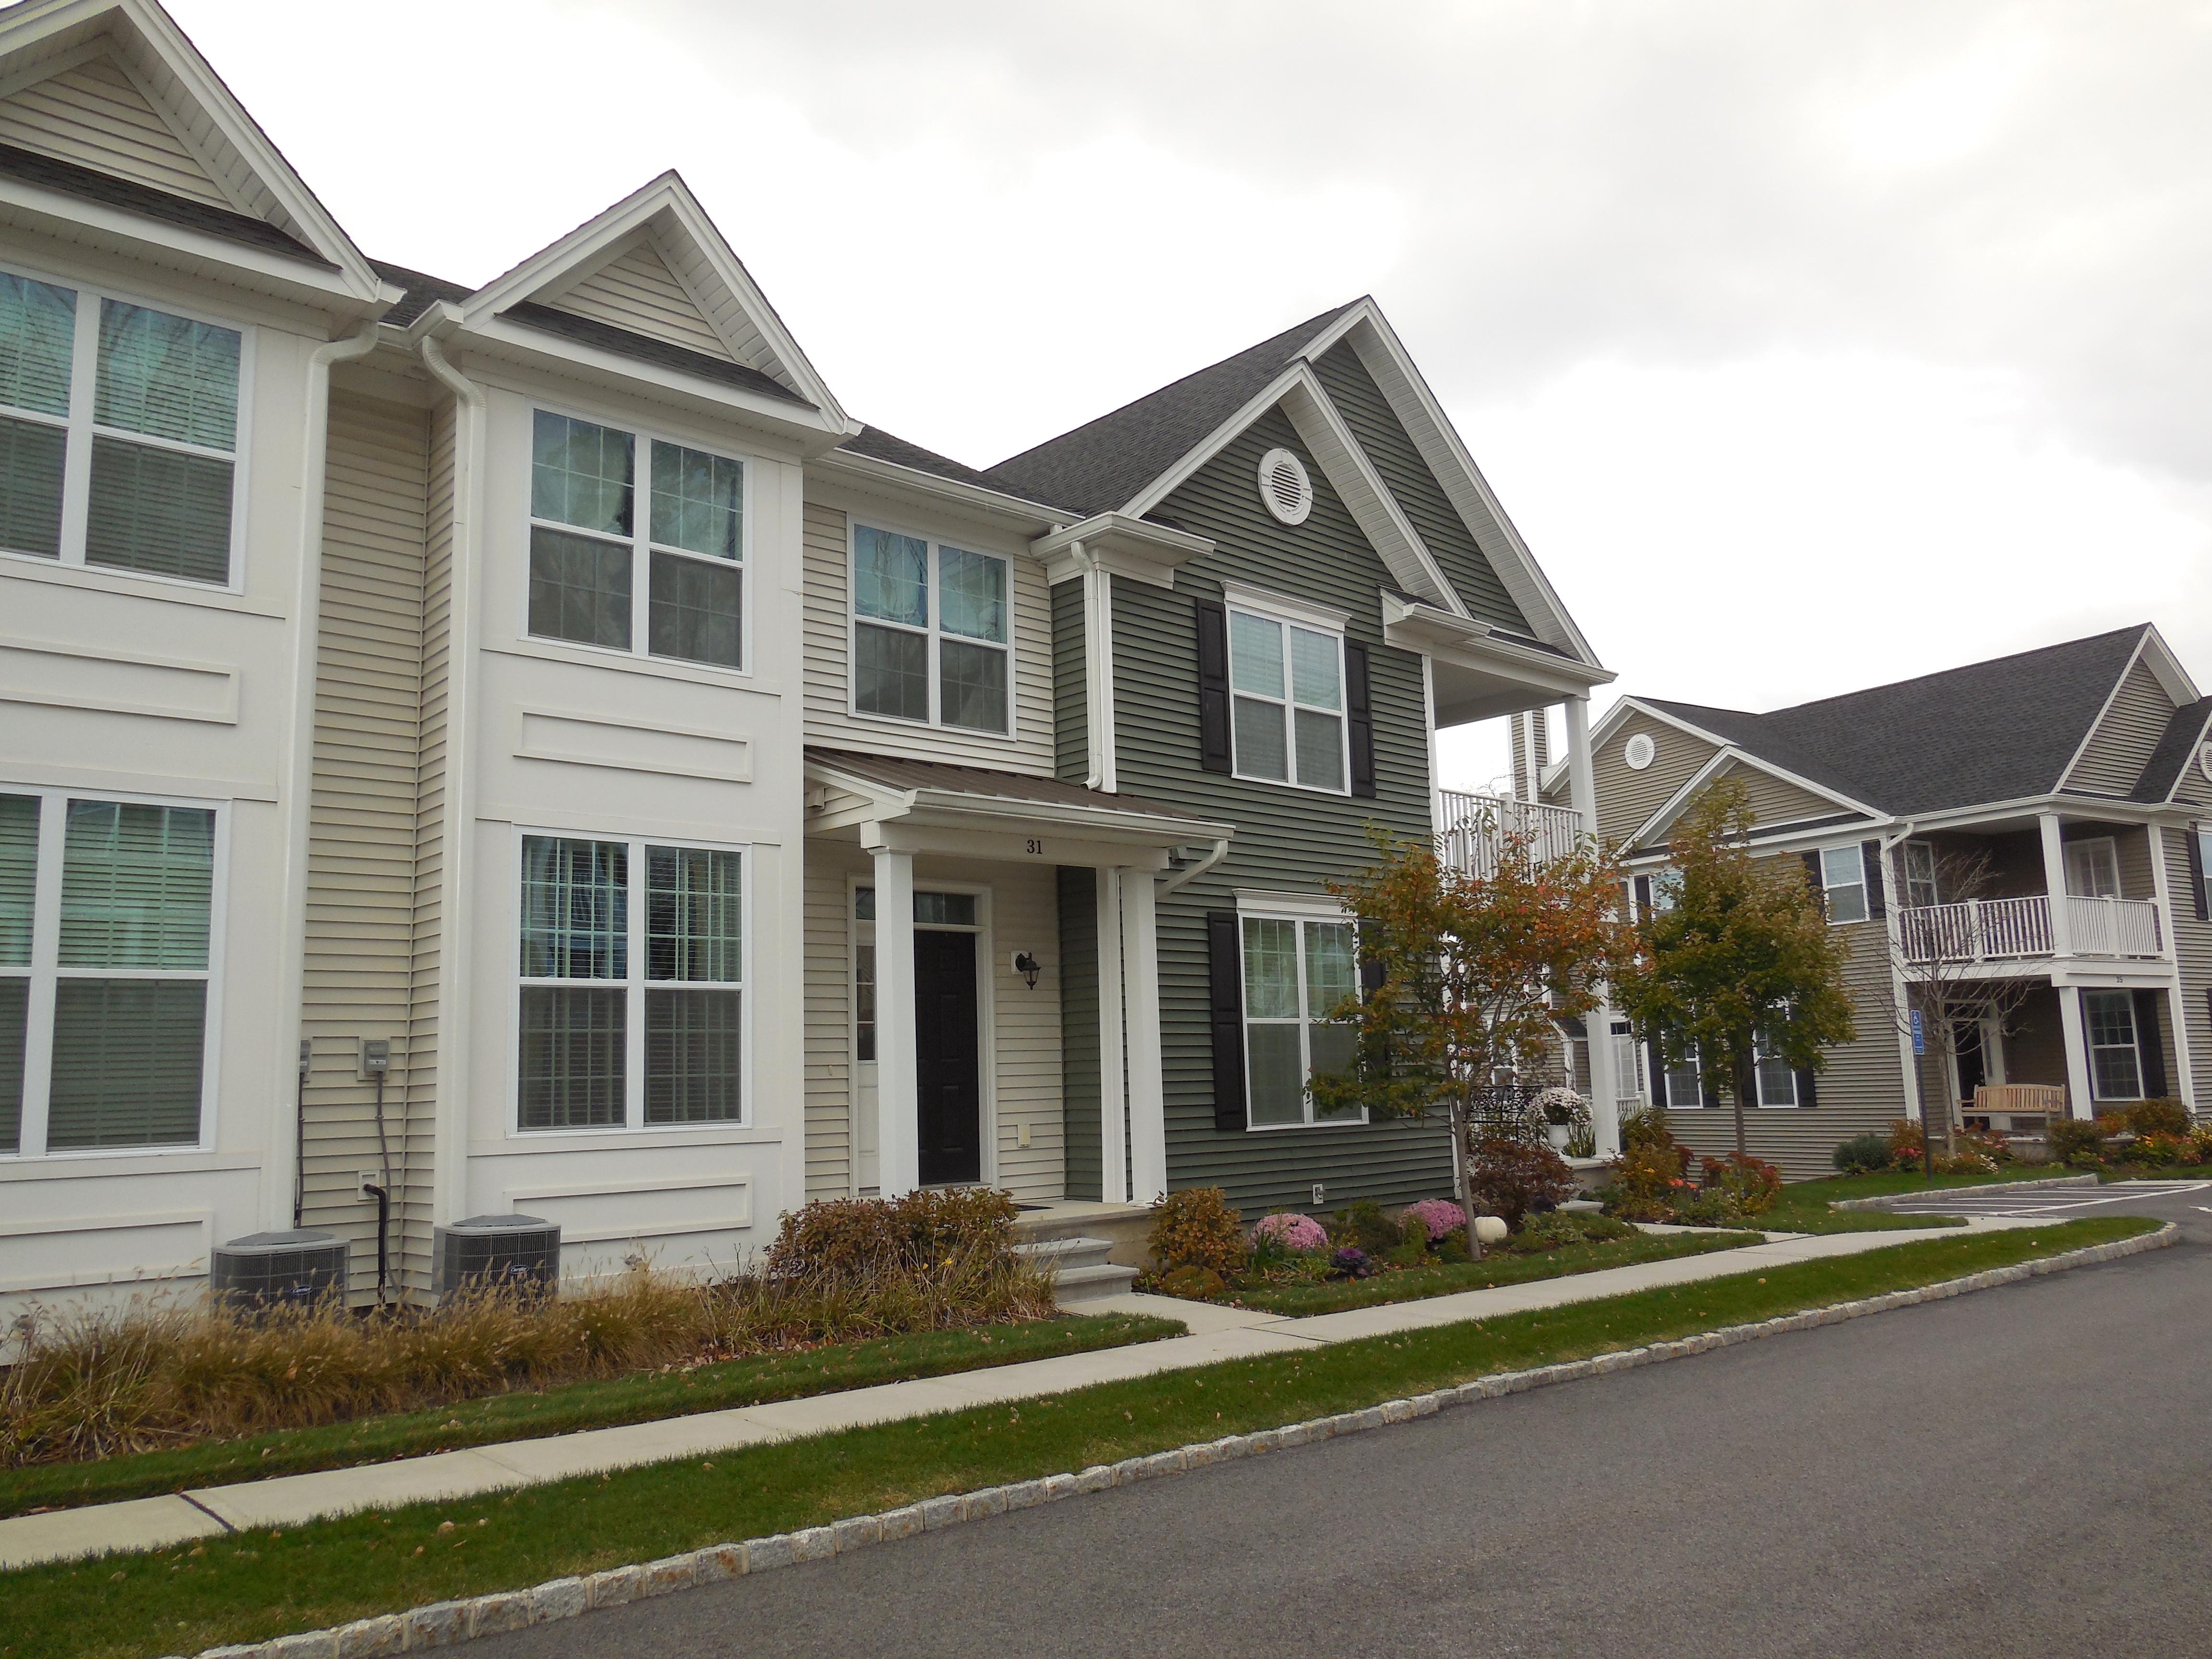 Townhouse for Sale at Rivington Townhouse 31 Warrington Round 31 Danbury, Connecticut, 06810 United States